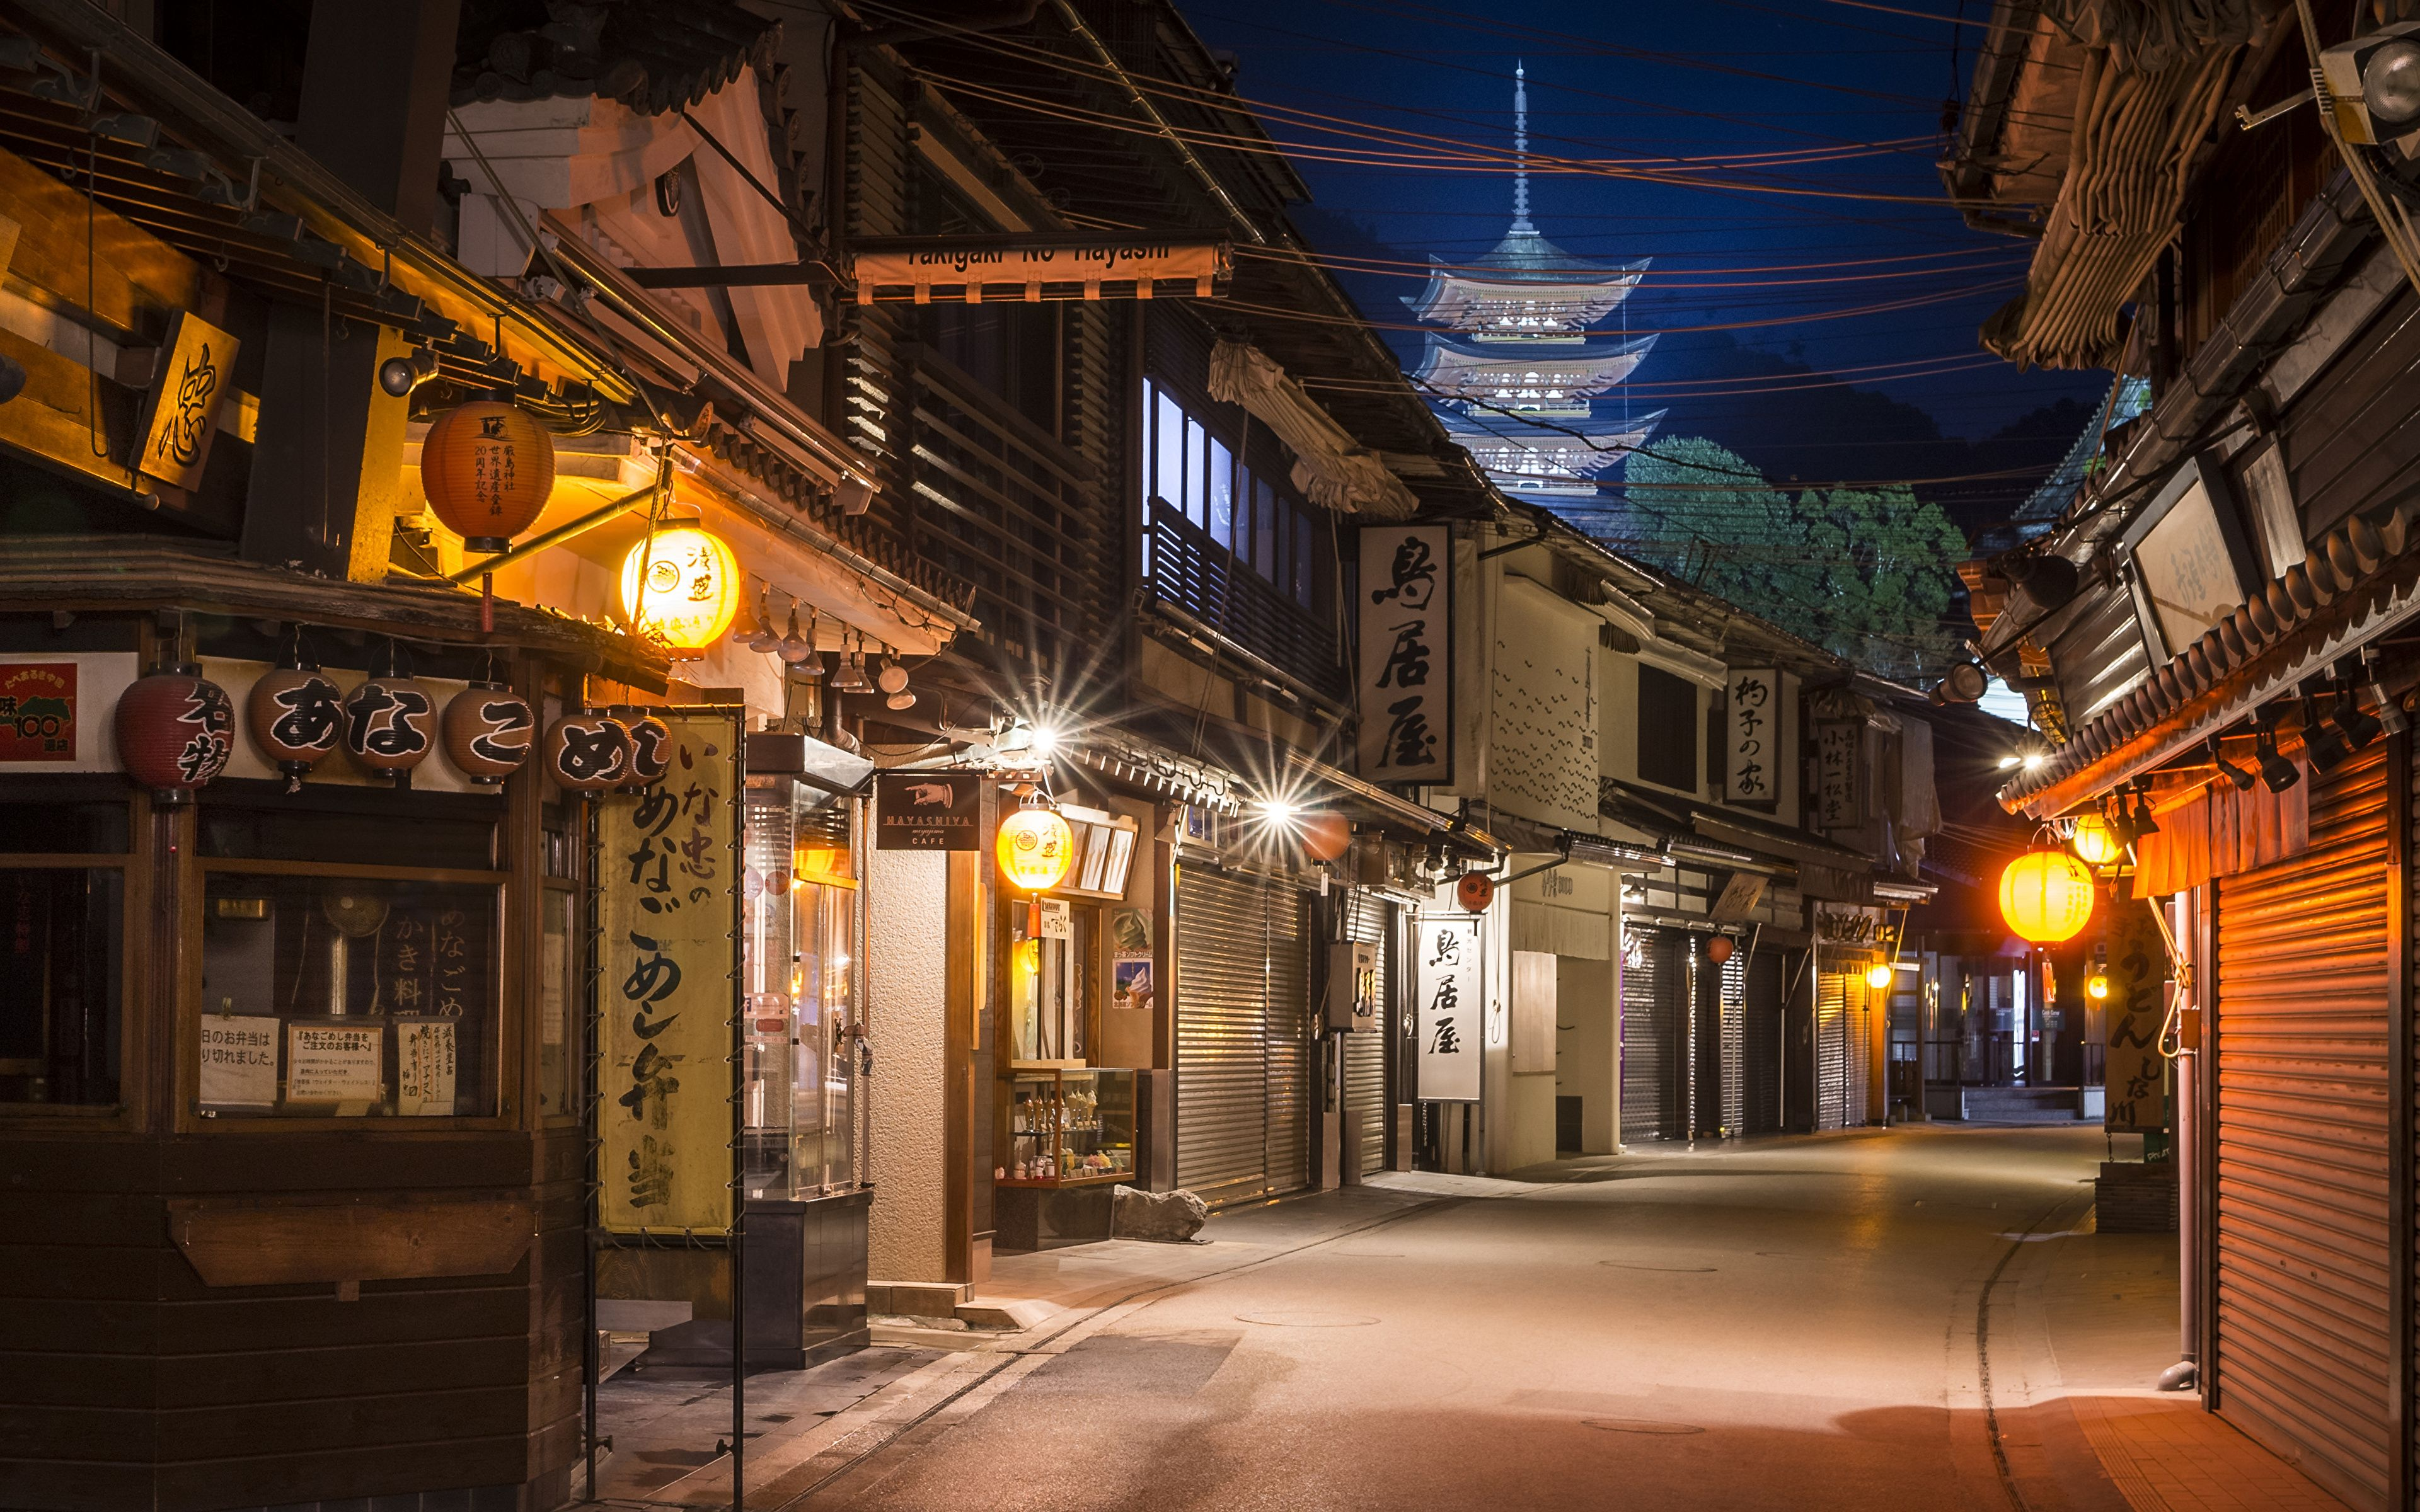 Japan Street Night Wallpapers - Top Free Japan Street ...